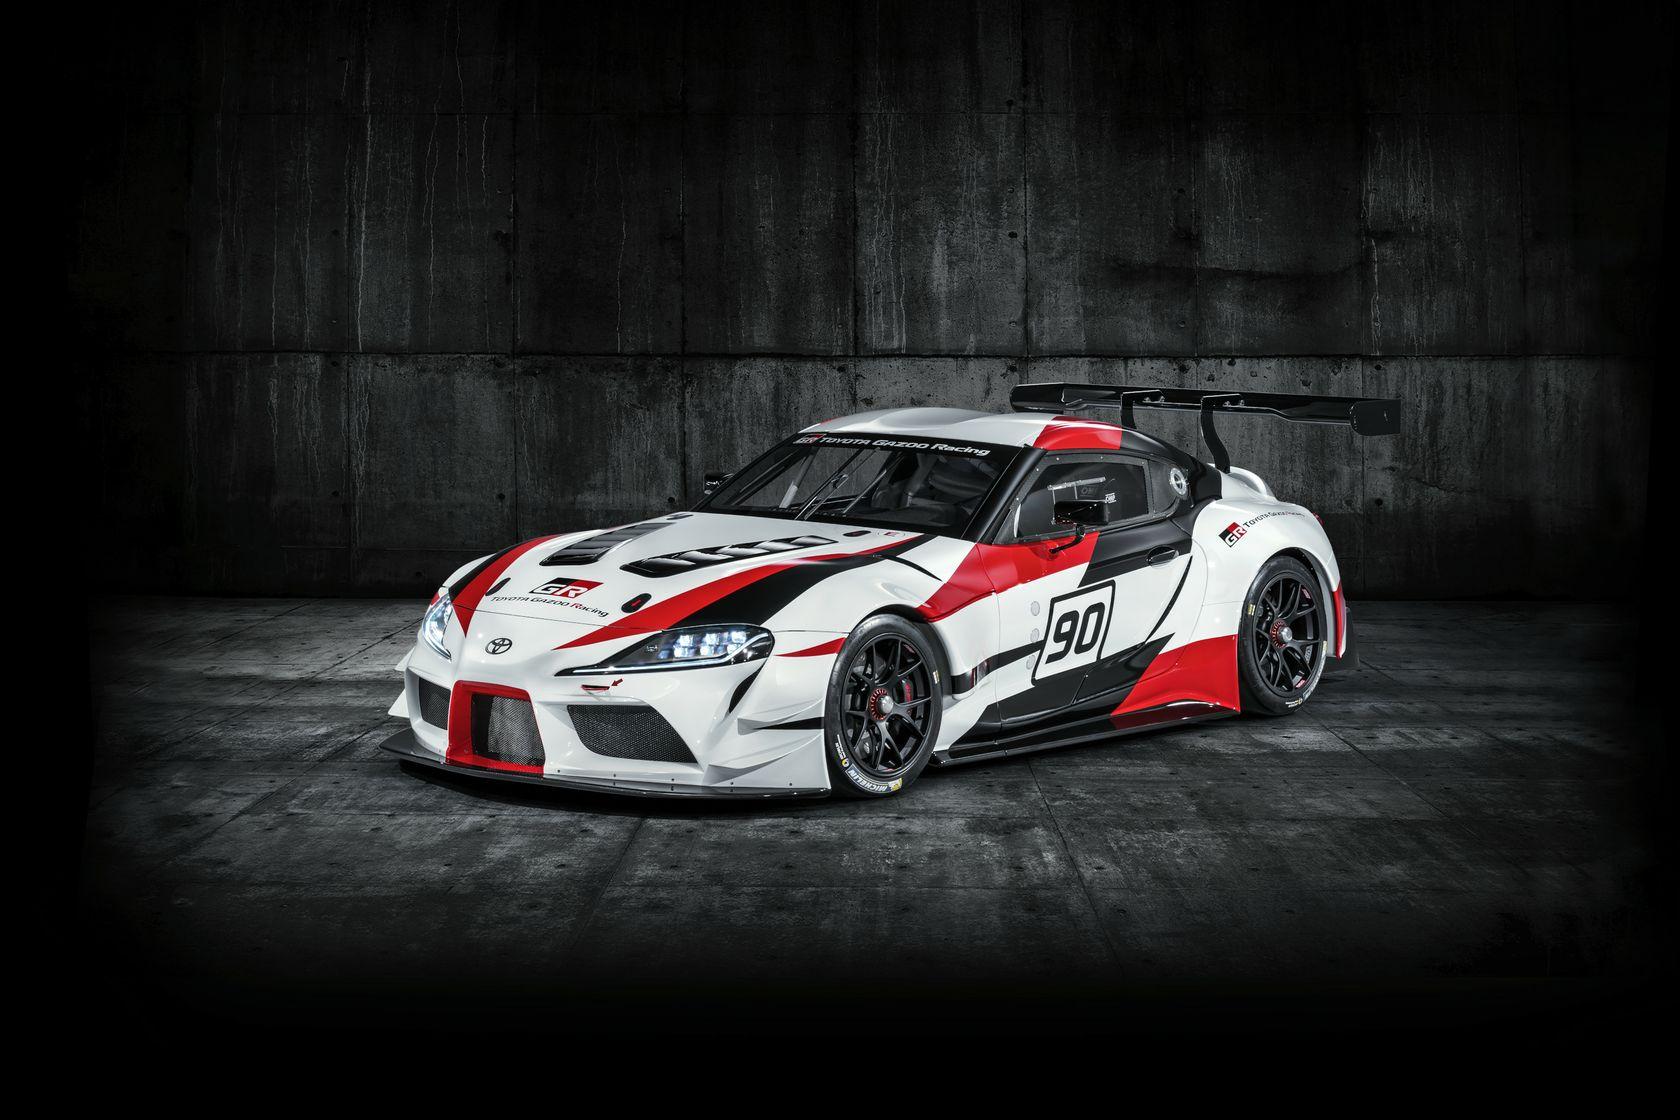 GR Supra Racing Concept - Studio - 04